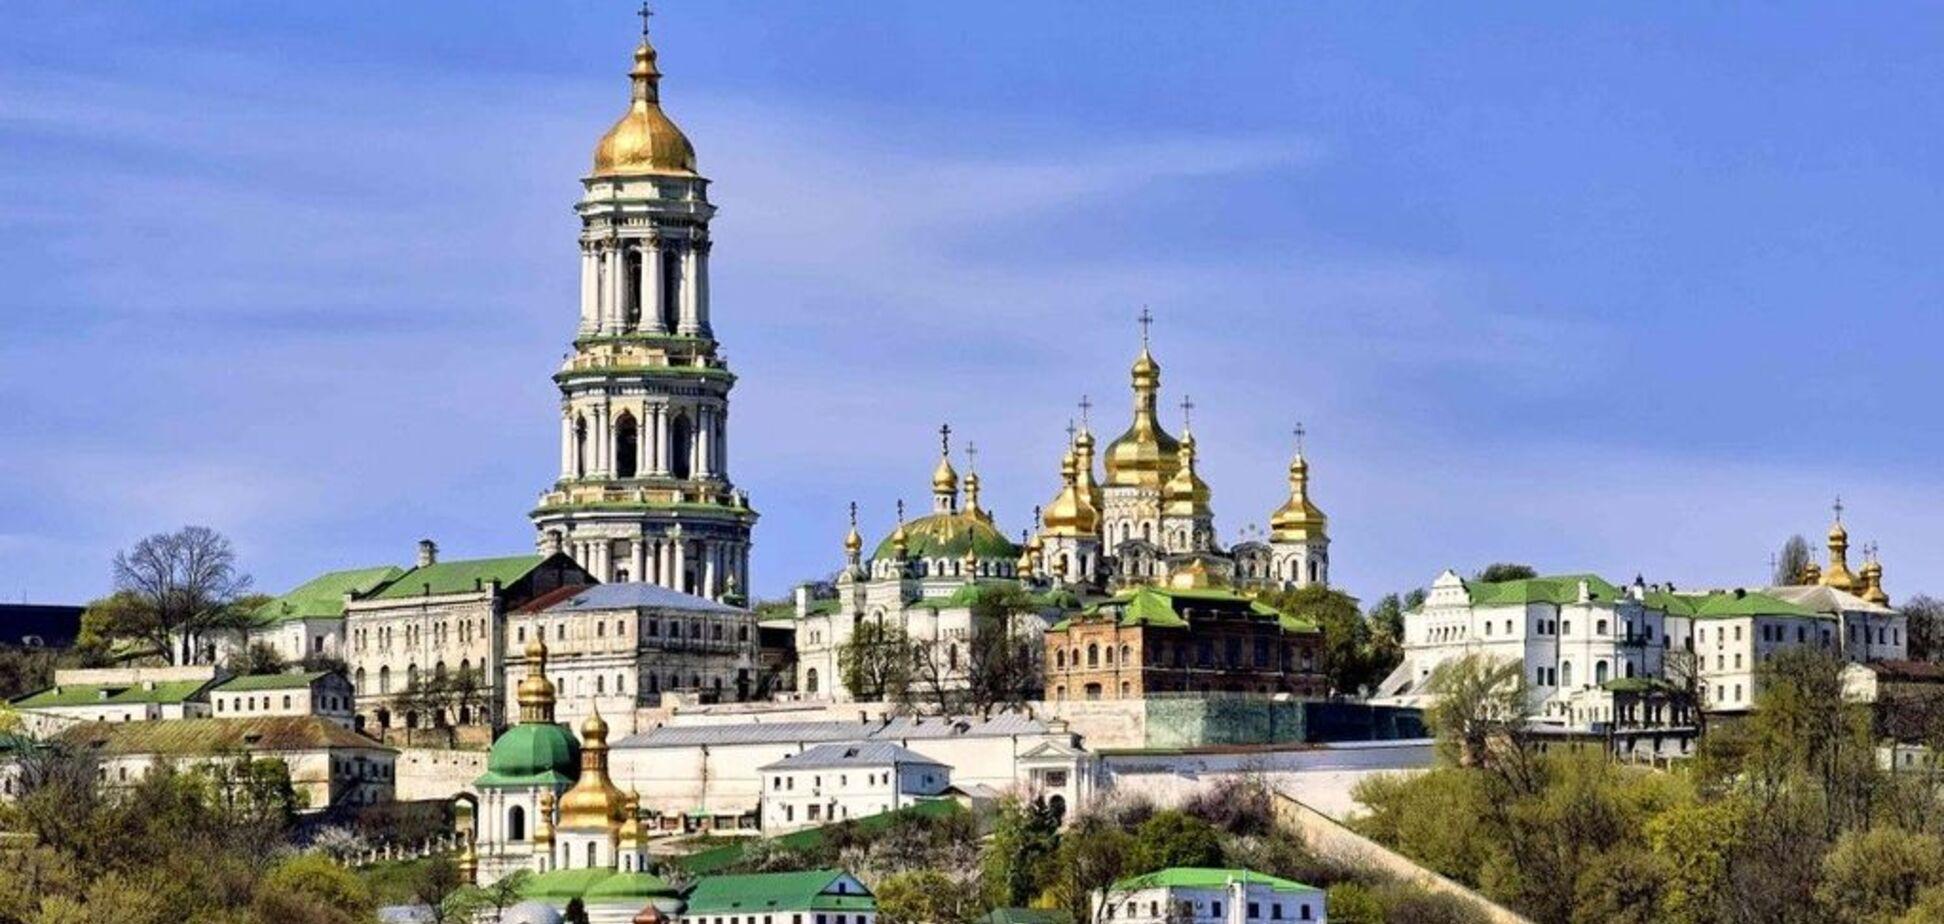 'Окупували нашу лавру!' Москву викрили в замаху на головну святиню Києва